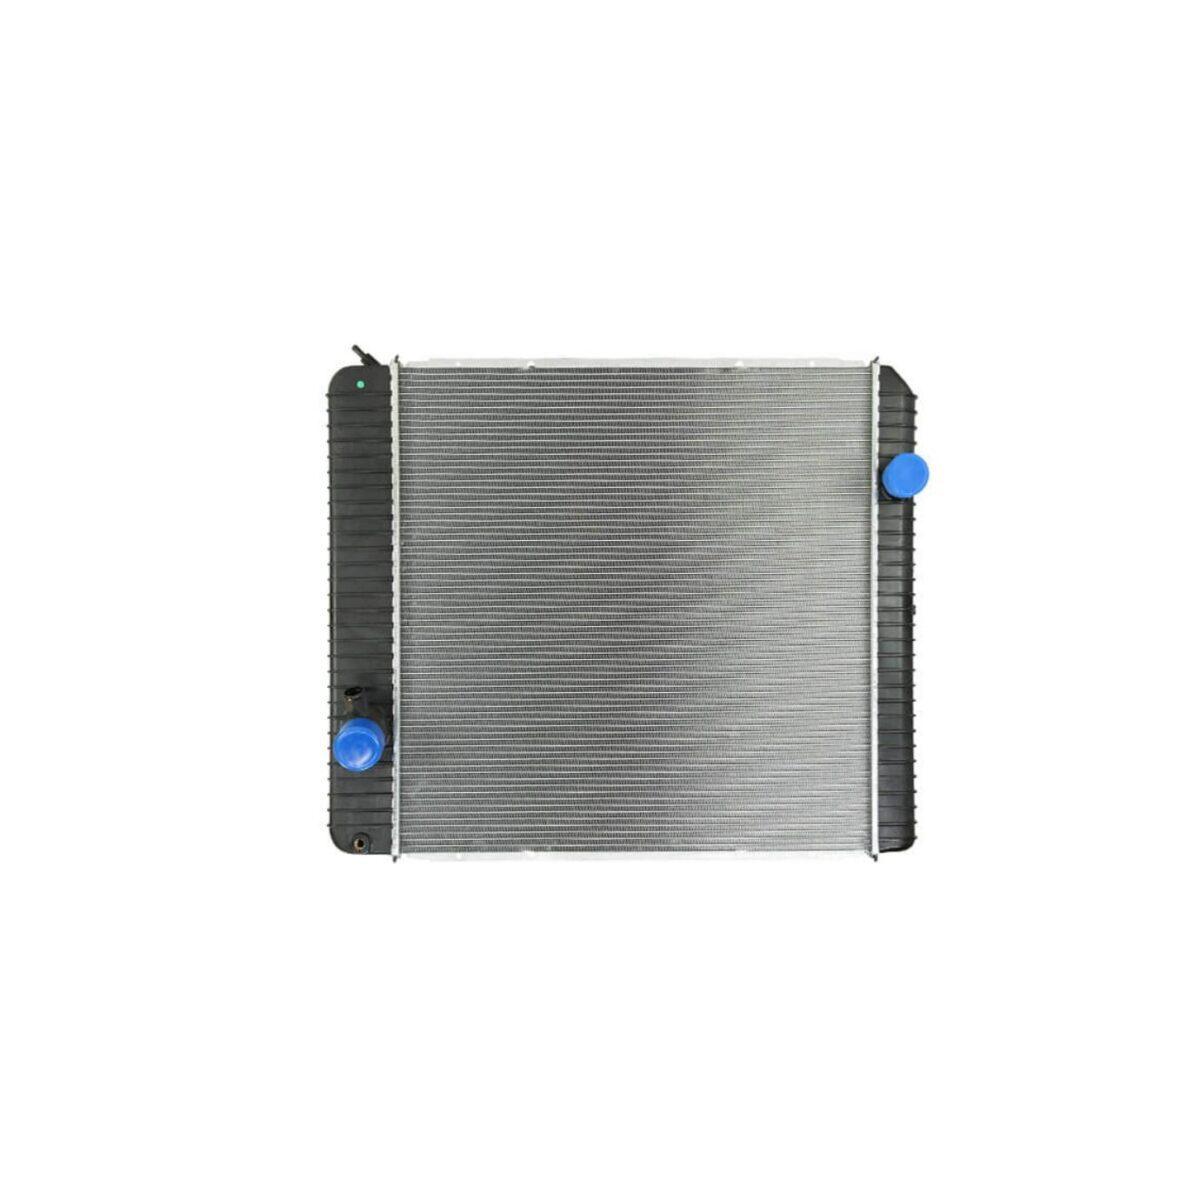 international 4400durastar 2011 2017 radiator oem 2593302c91 2